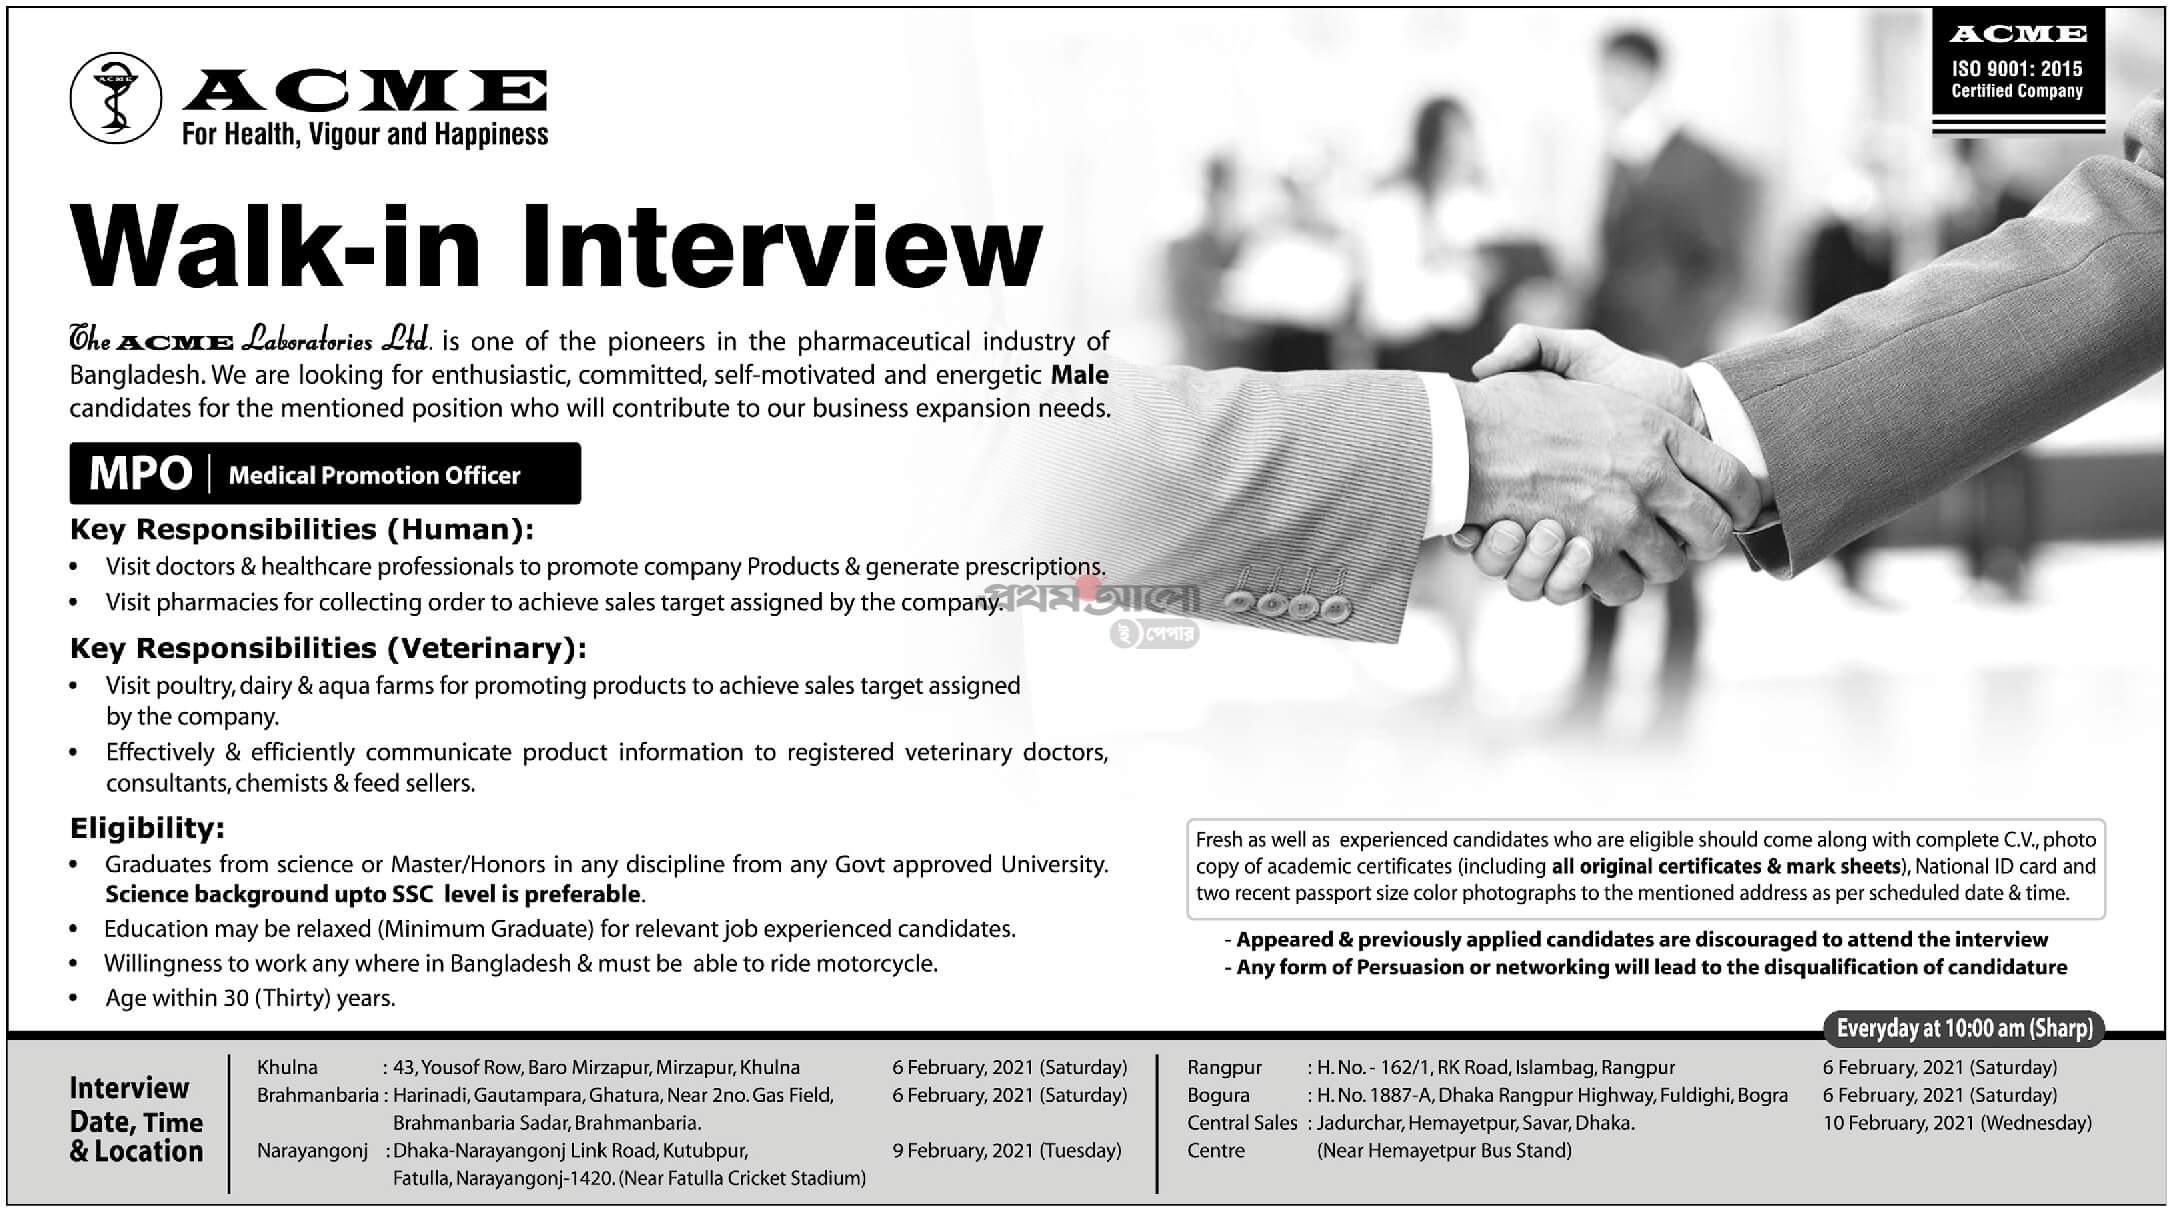 ACME Laboratories Ltd Job Circular 2021